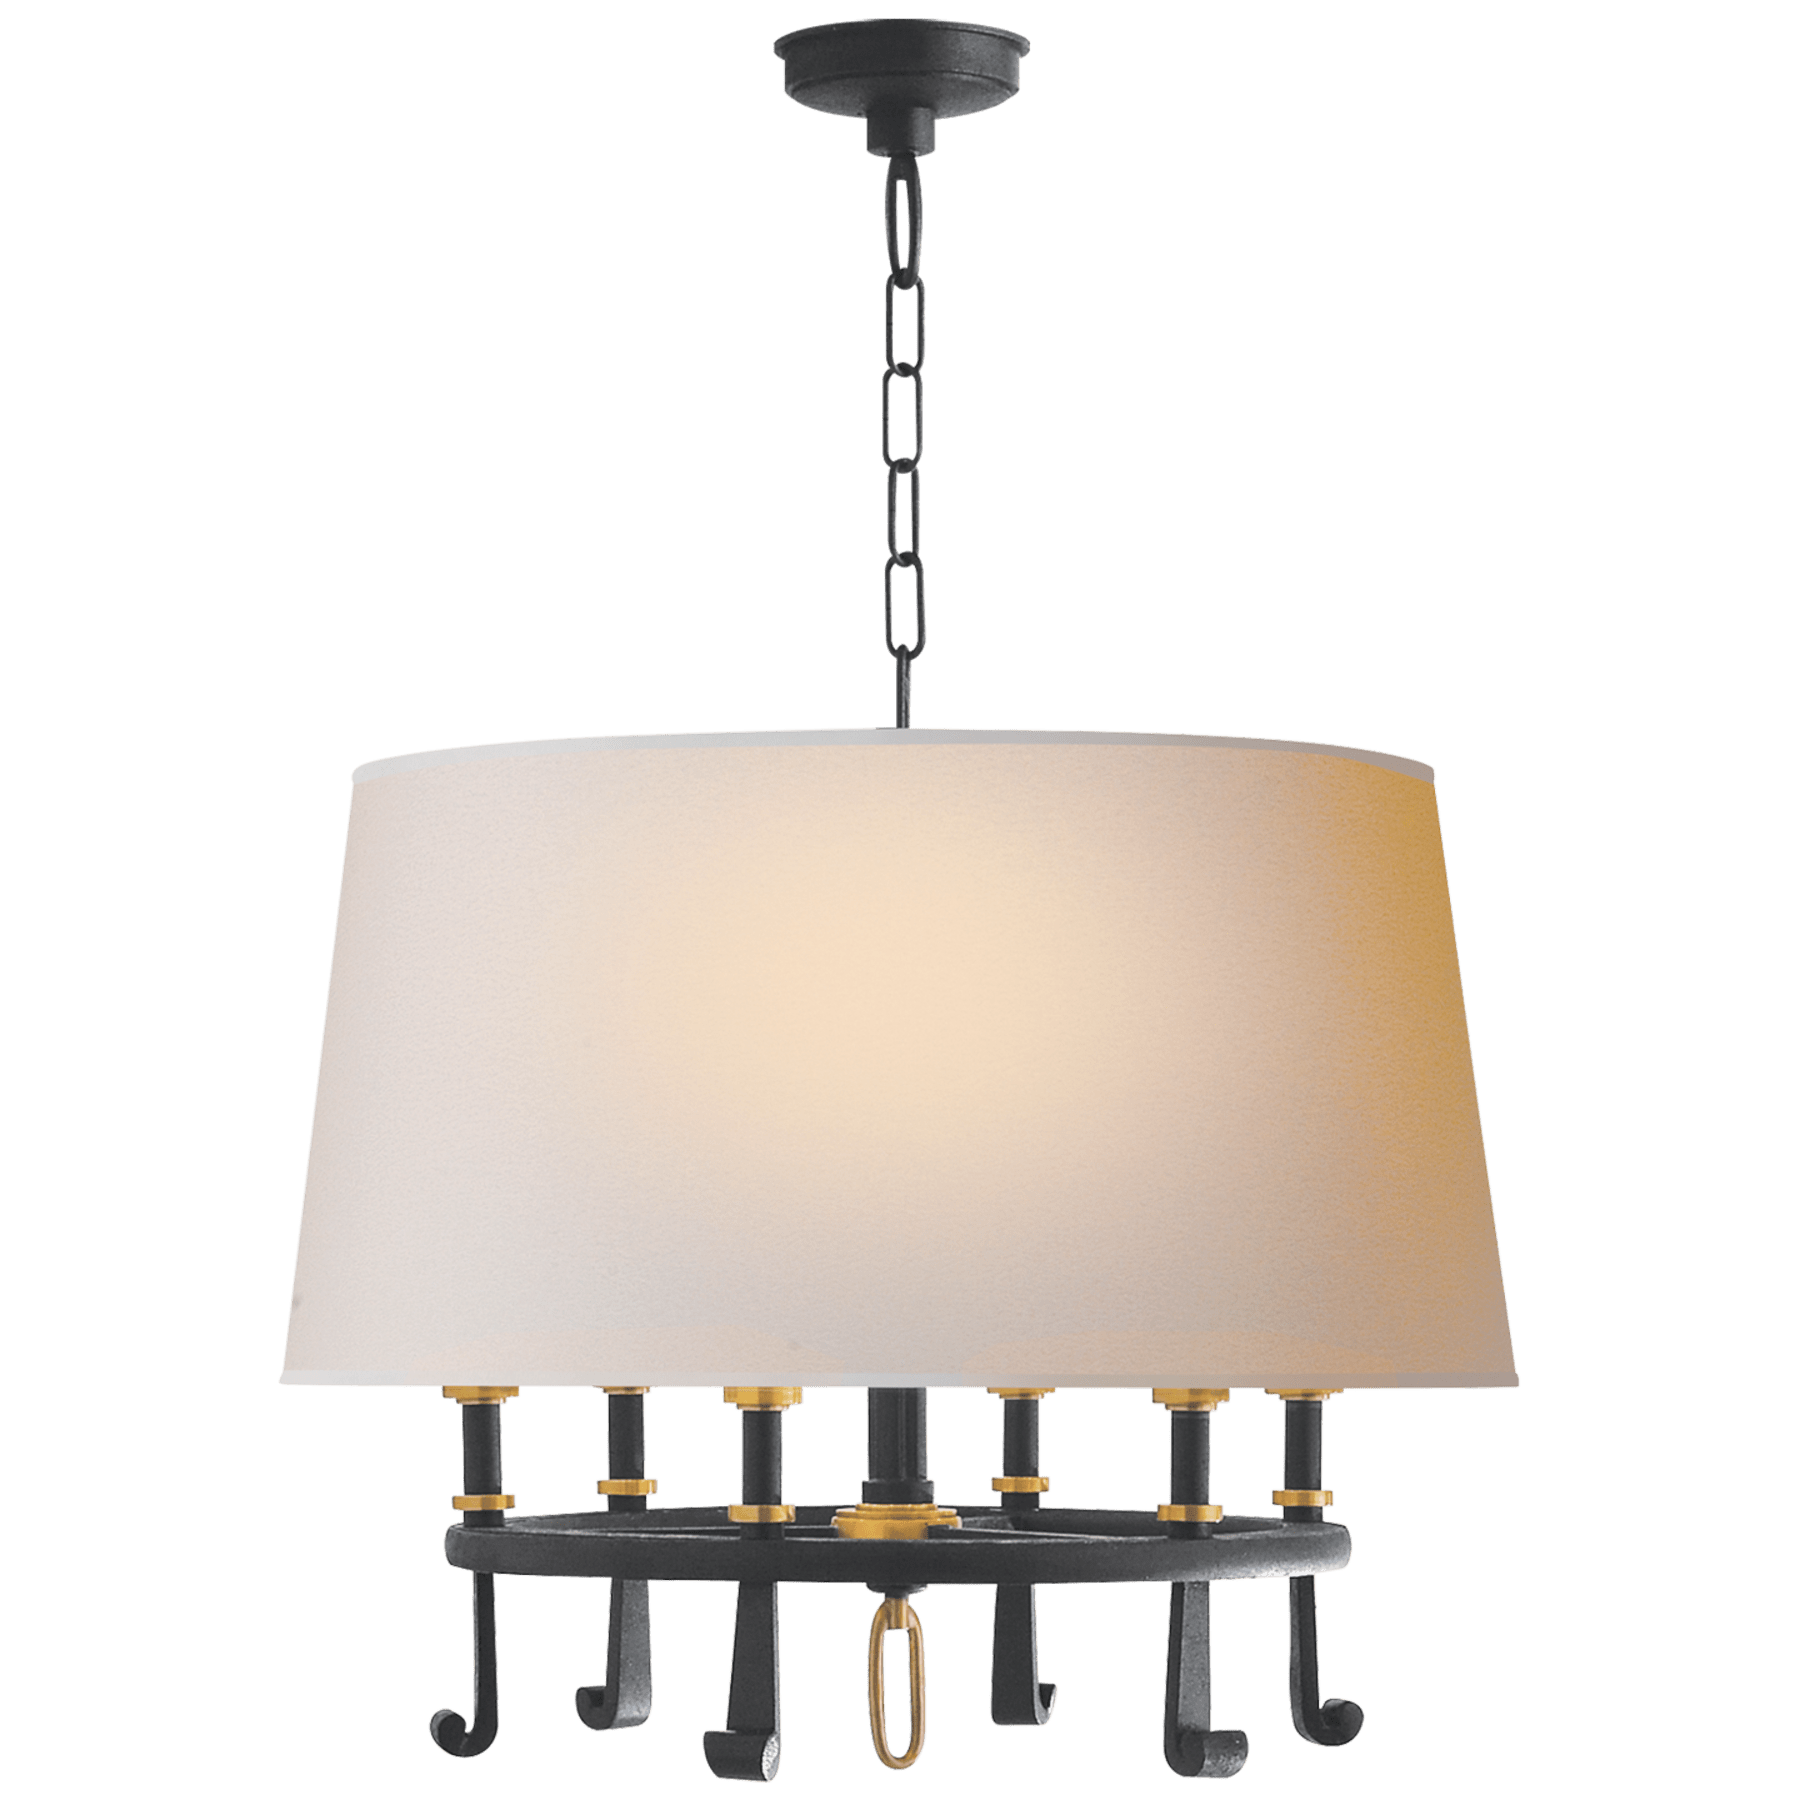 Calliope Hanging Shade Hanging Shade Ceiling Circa Lighting